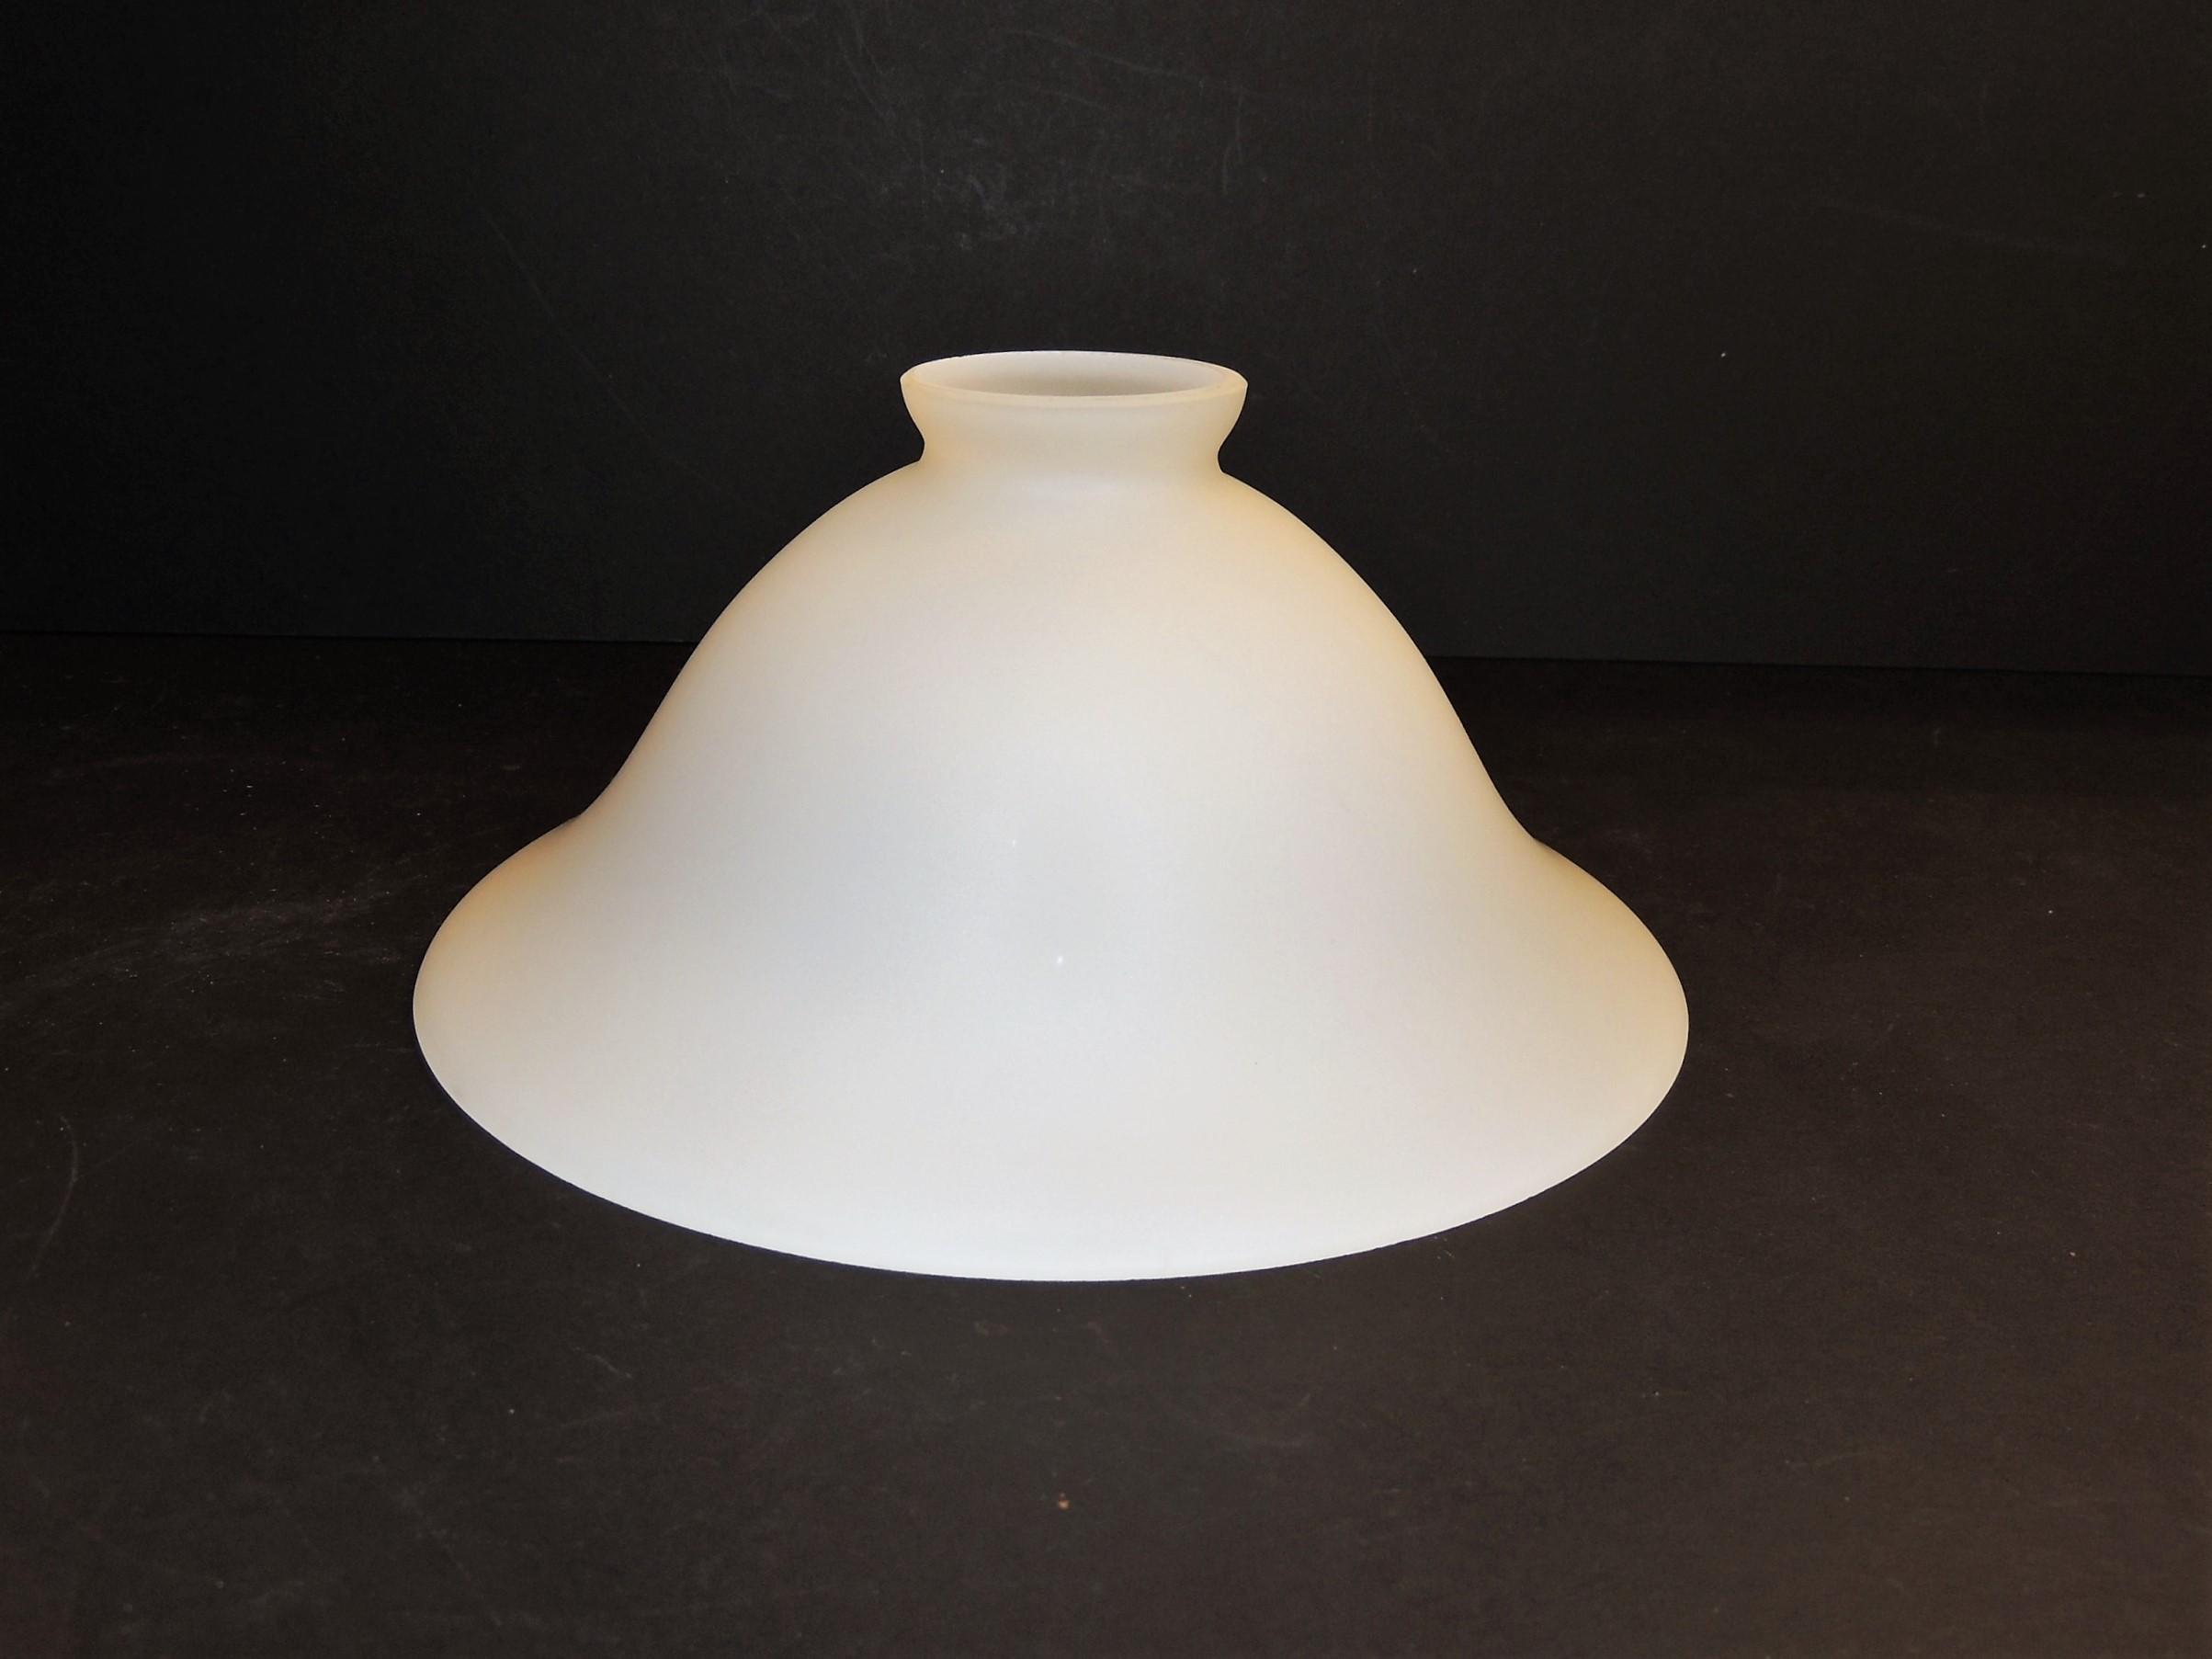 Vetri di ricambio per lampadari vetro per lampada for Rossi lampadari